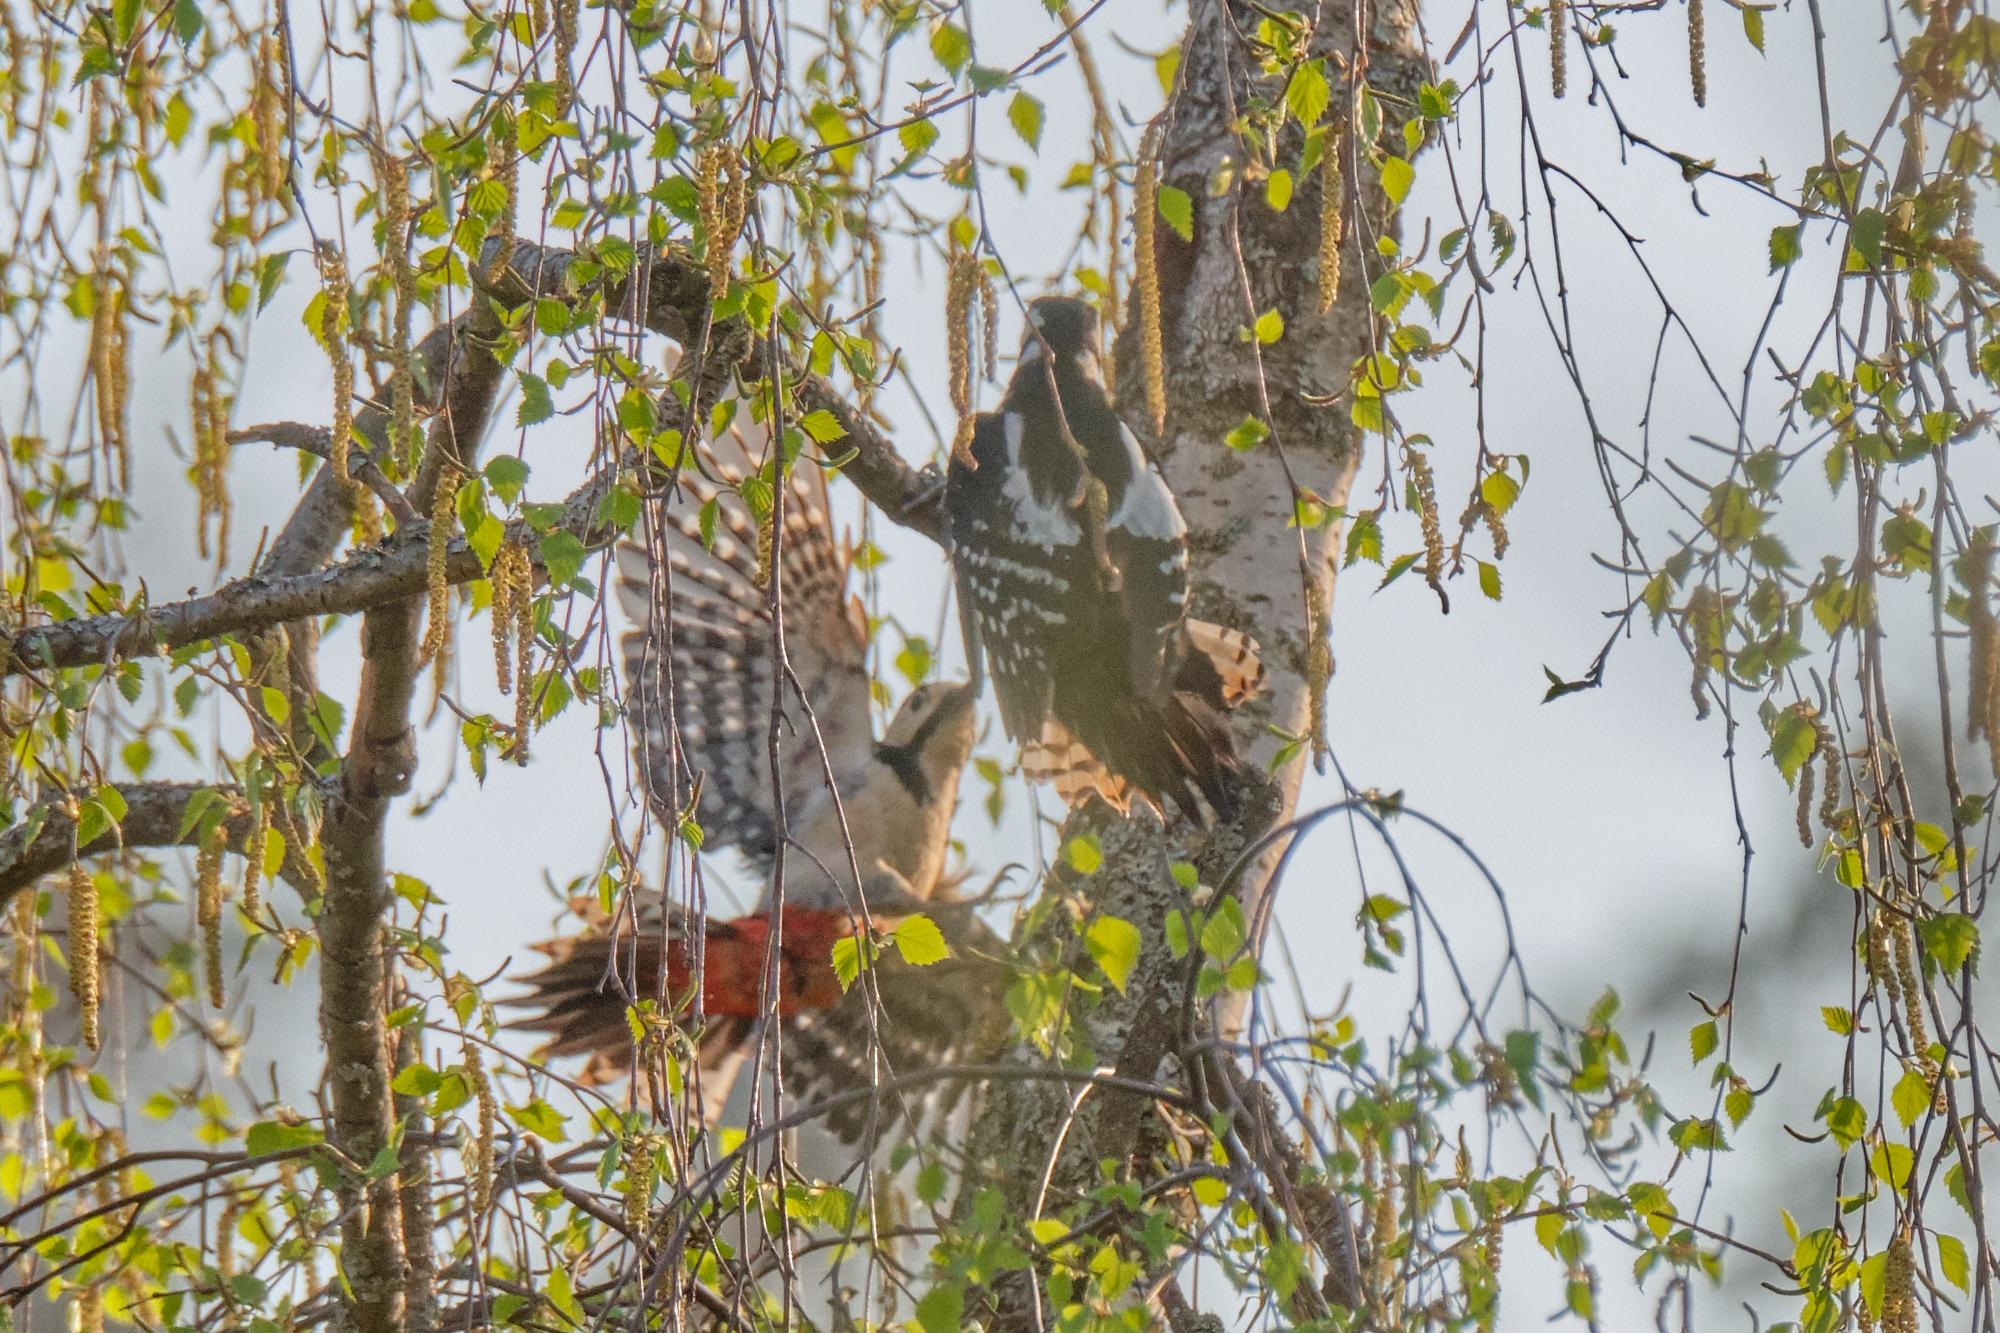 Buntspechte / great spotted woodpeckers